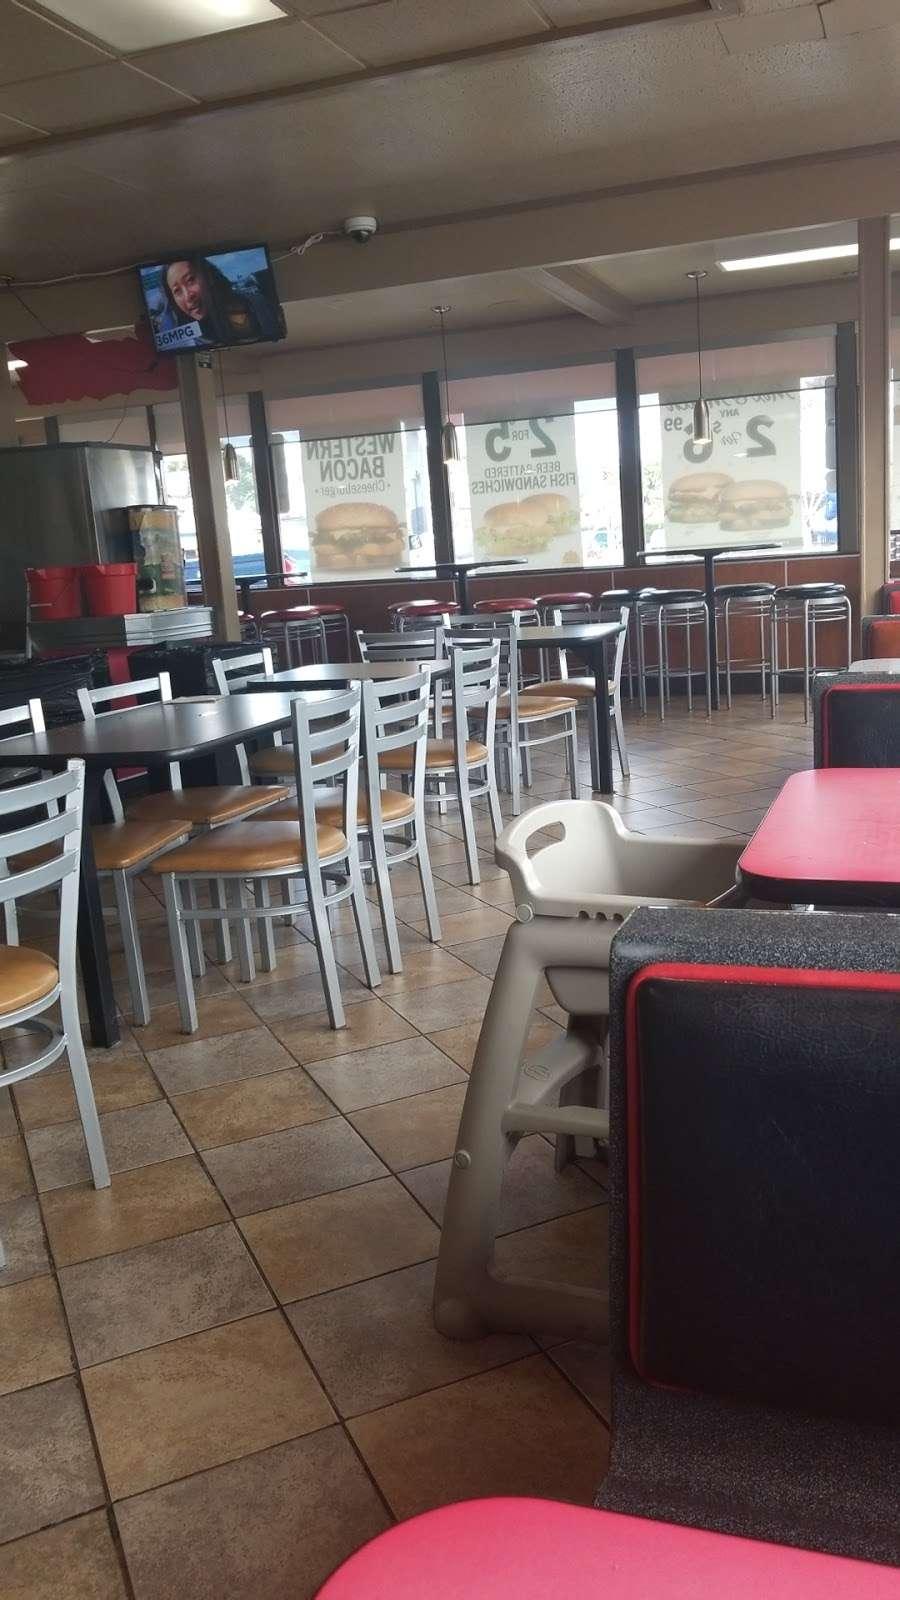 Carls Jr. - restaurant  | Photo 5 of 10 | Address: 18756 Sherman Way, Reseda, CA 91335, USA | Phone: (818) 881-8775